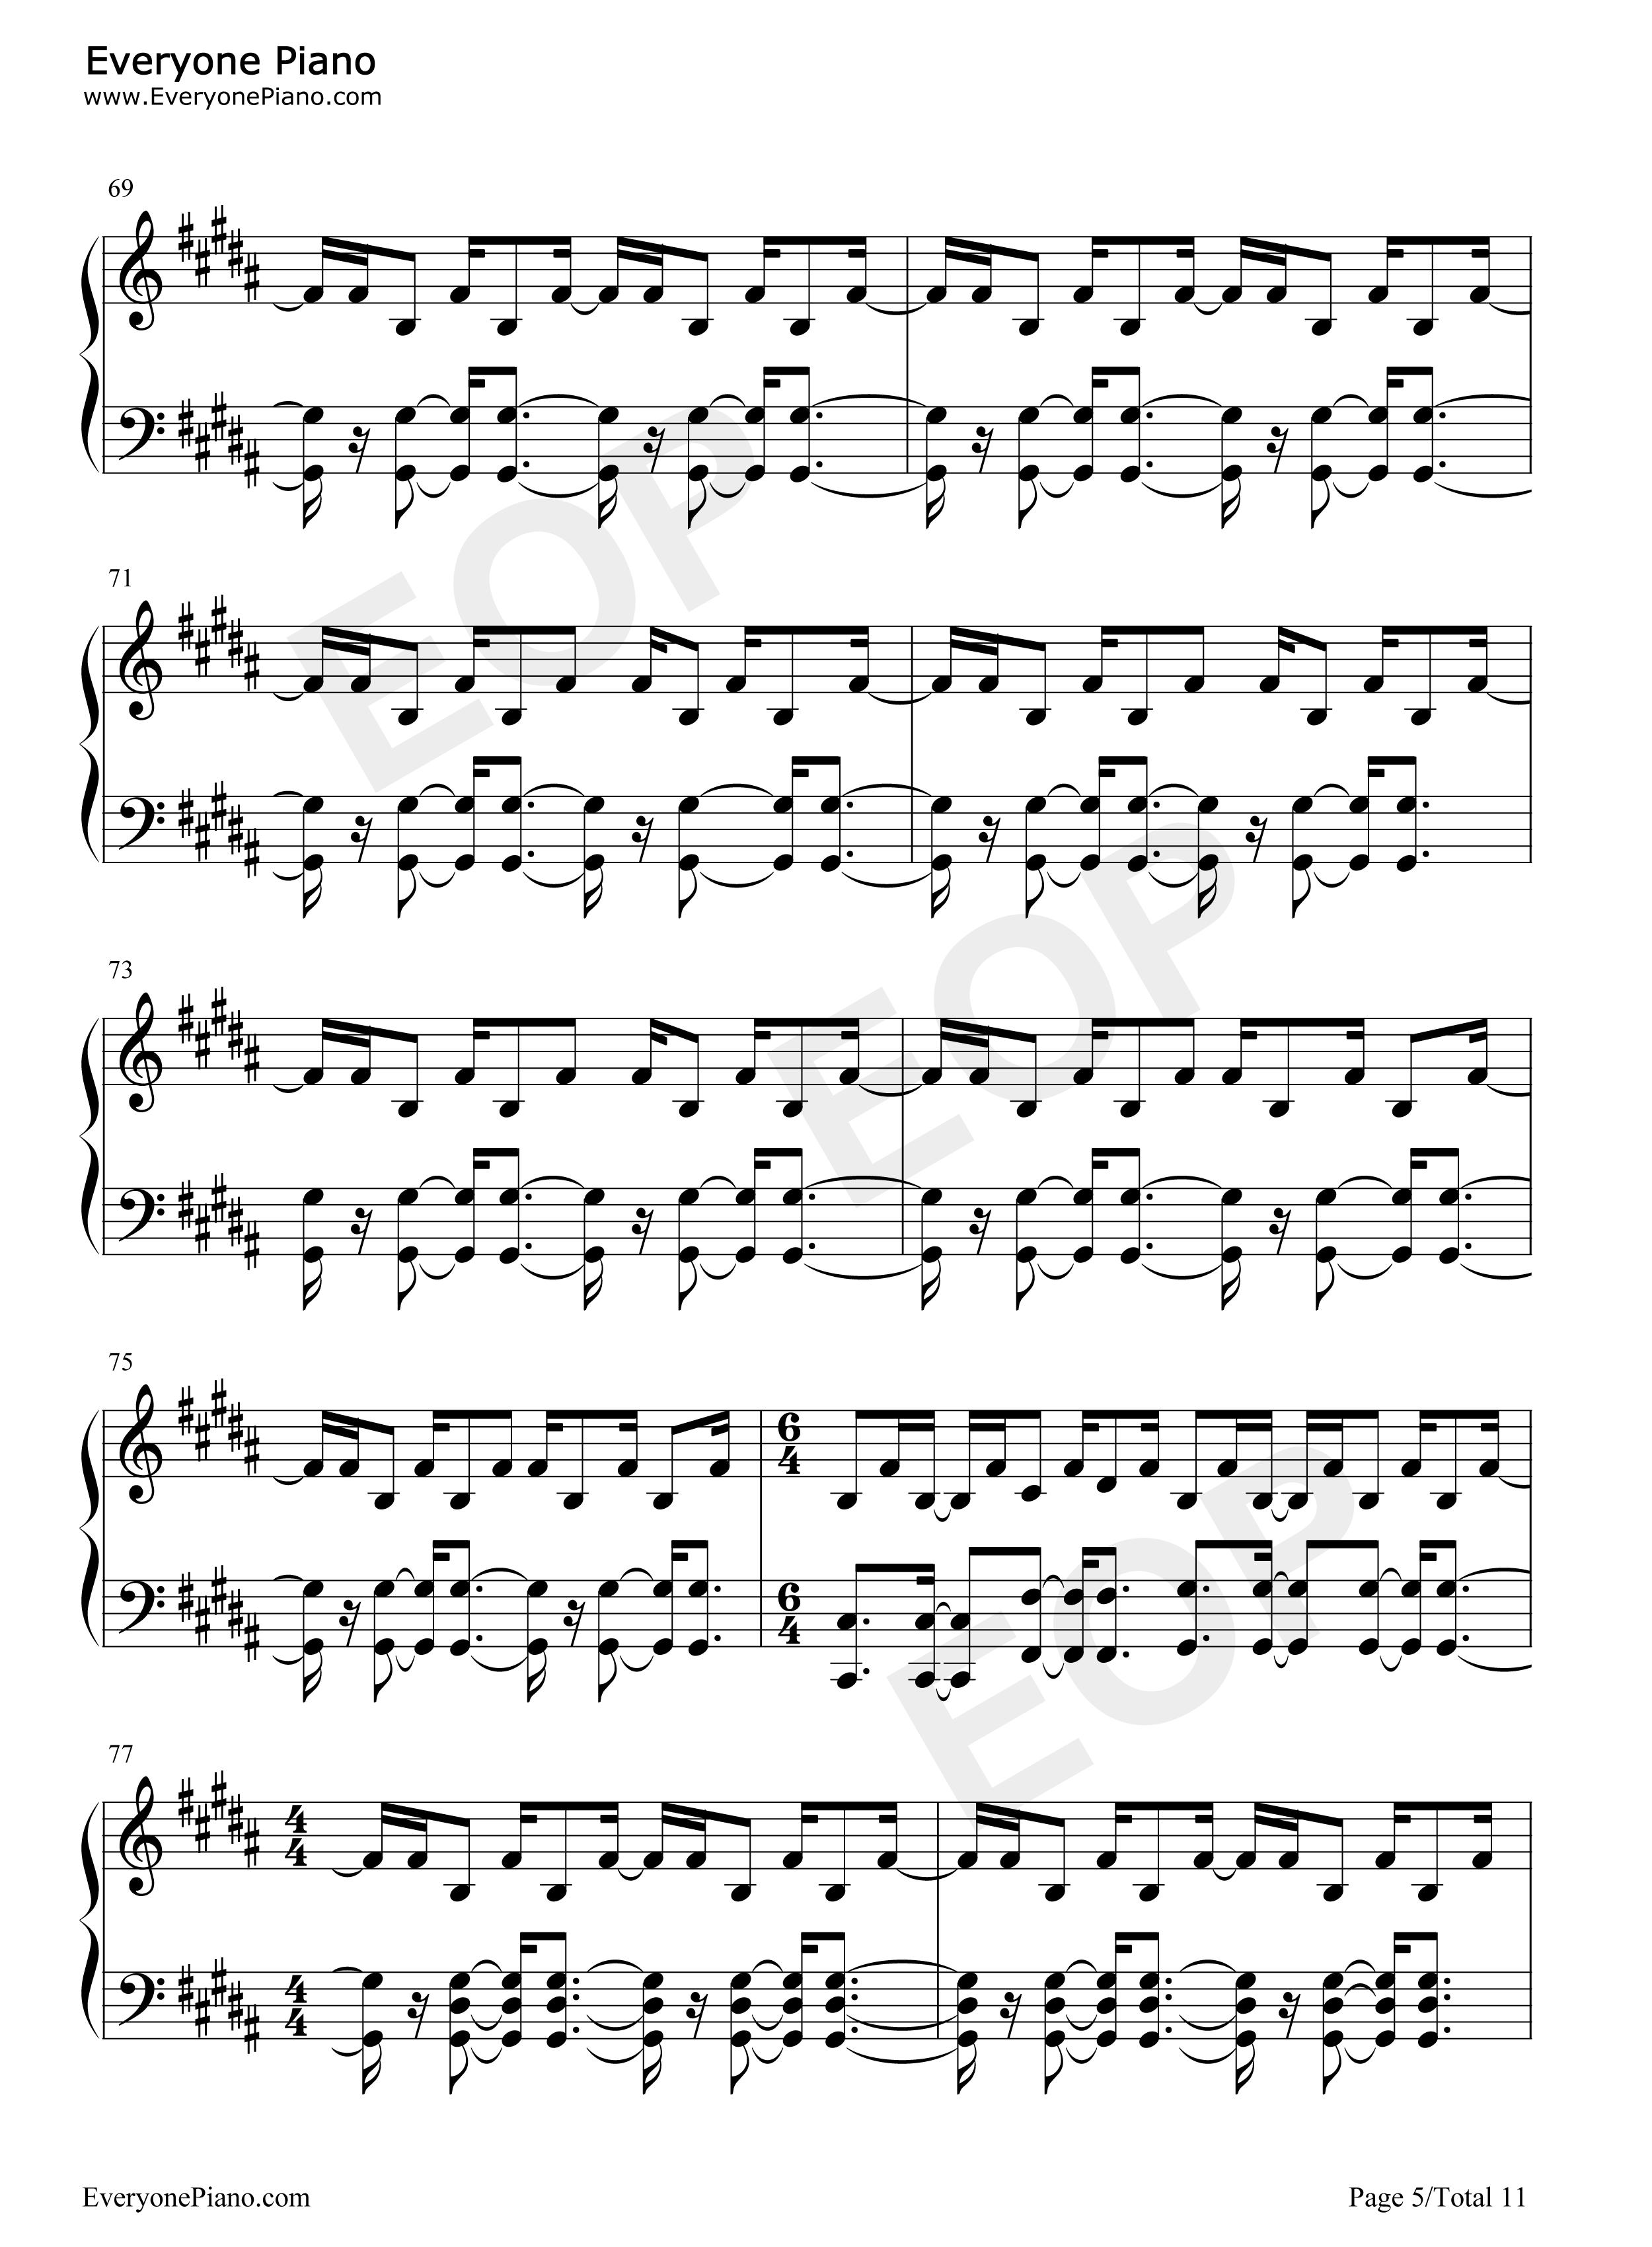 Strobe-Deadmau5 Stave Preview 5-Free Piano Sheet Music u0026 Piano Chords